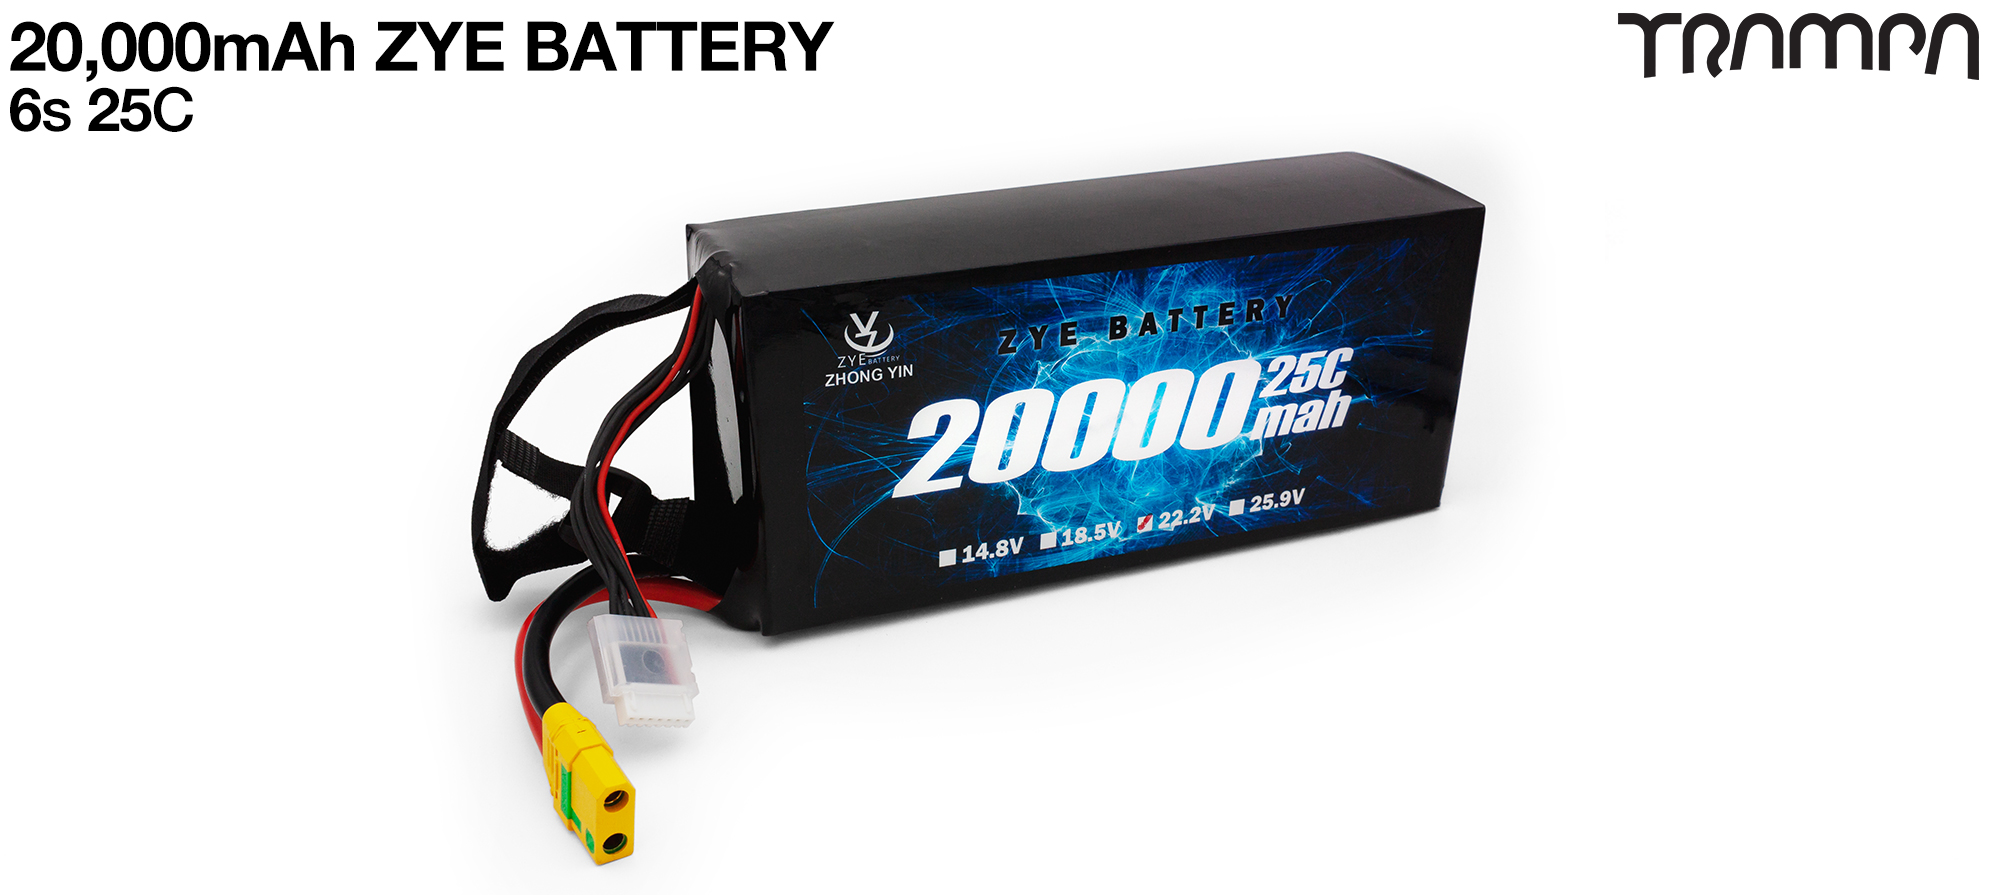 Please supply 2x 6s 20A ZYE Li-Po Cells & 1x 12s Cable kit (+£300)